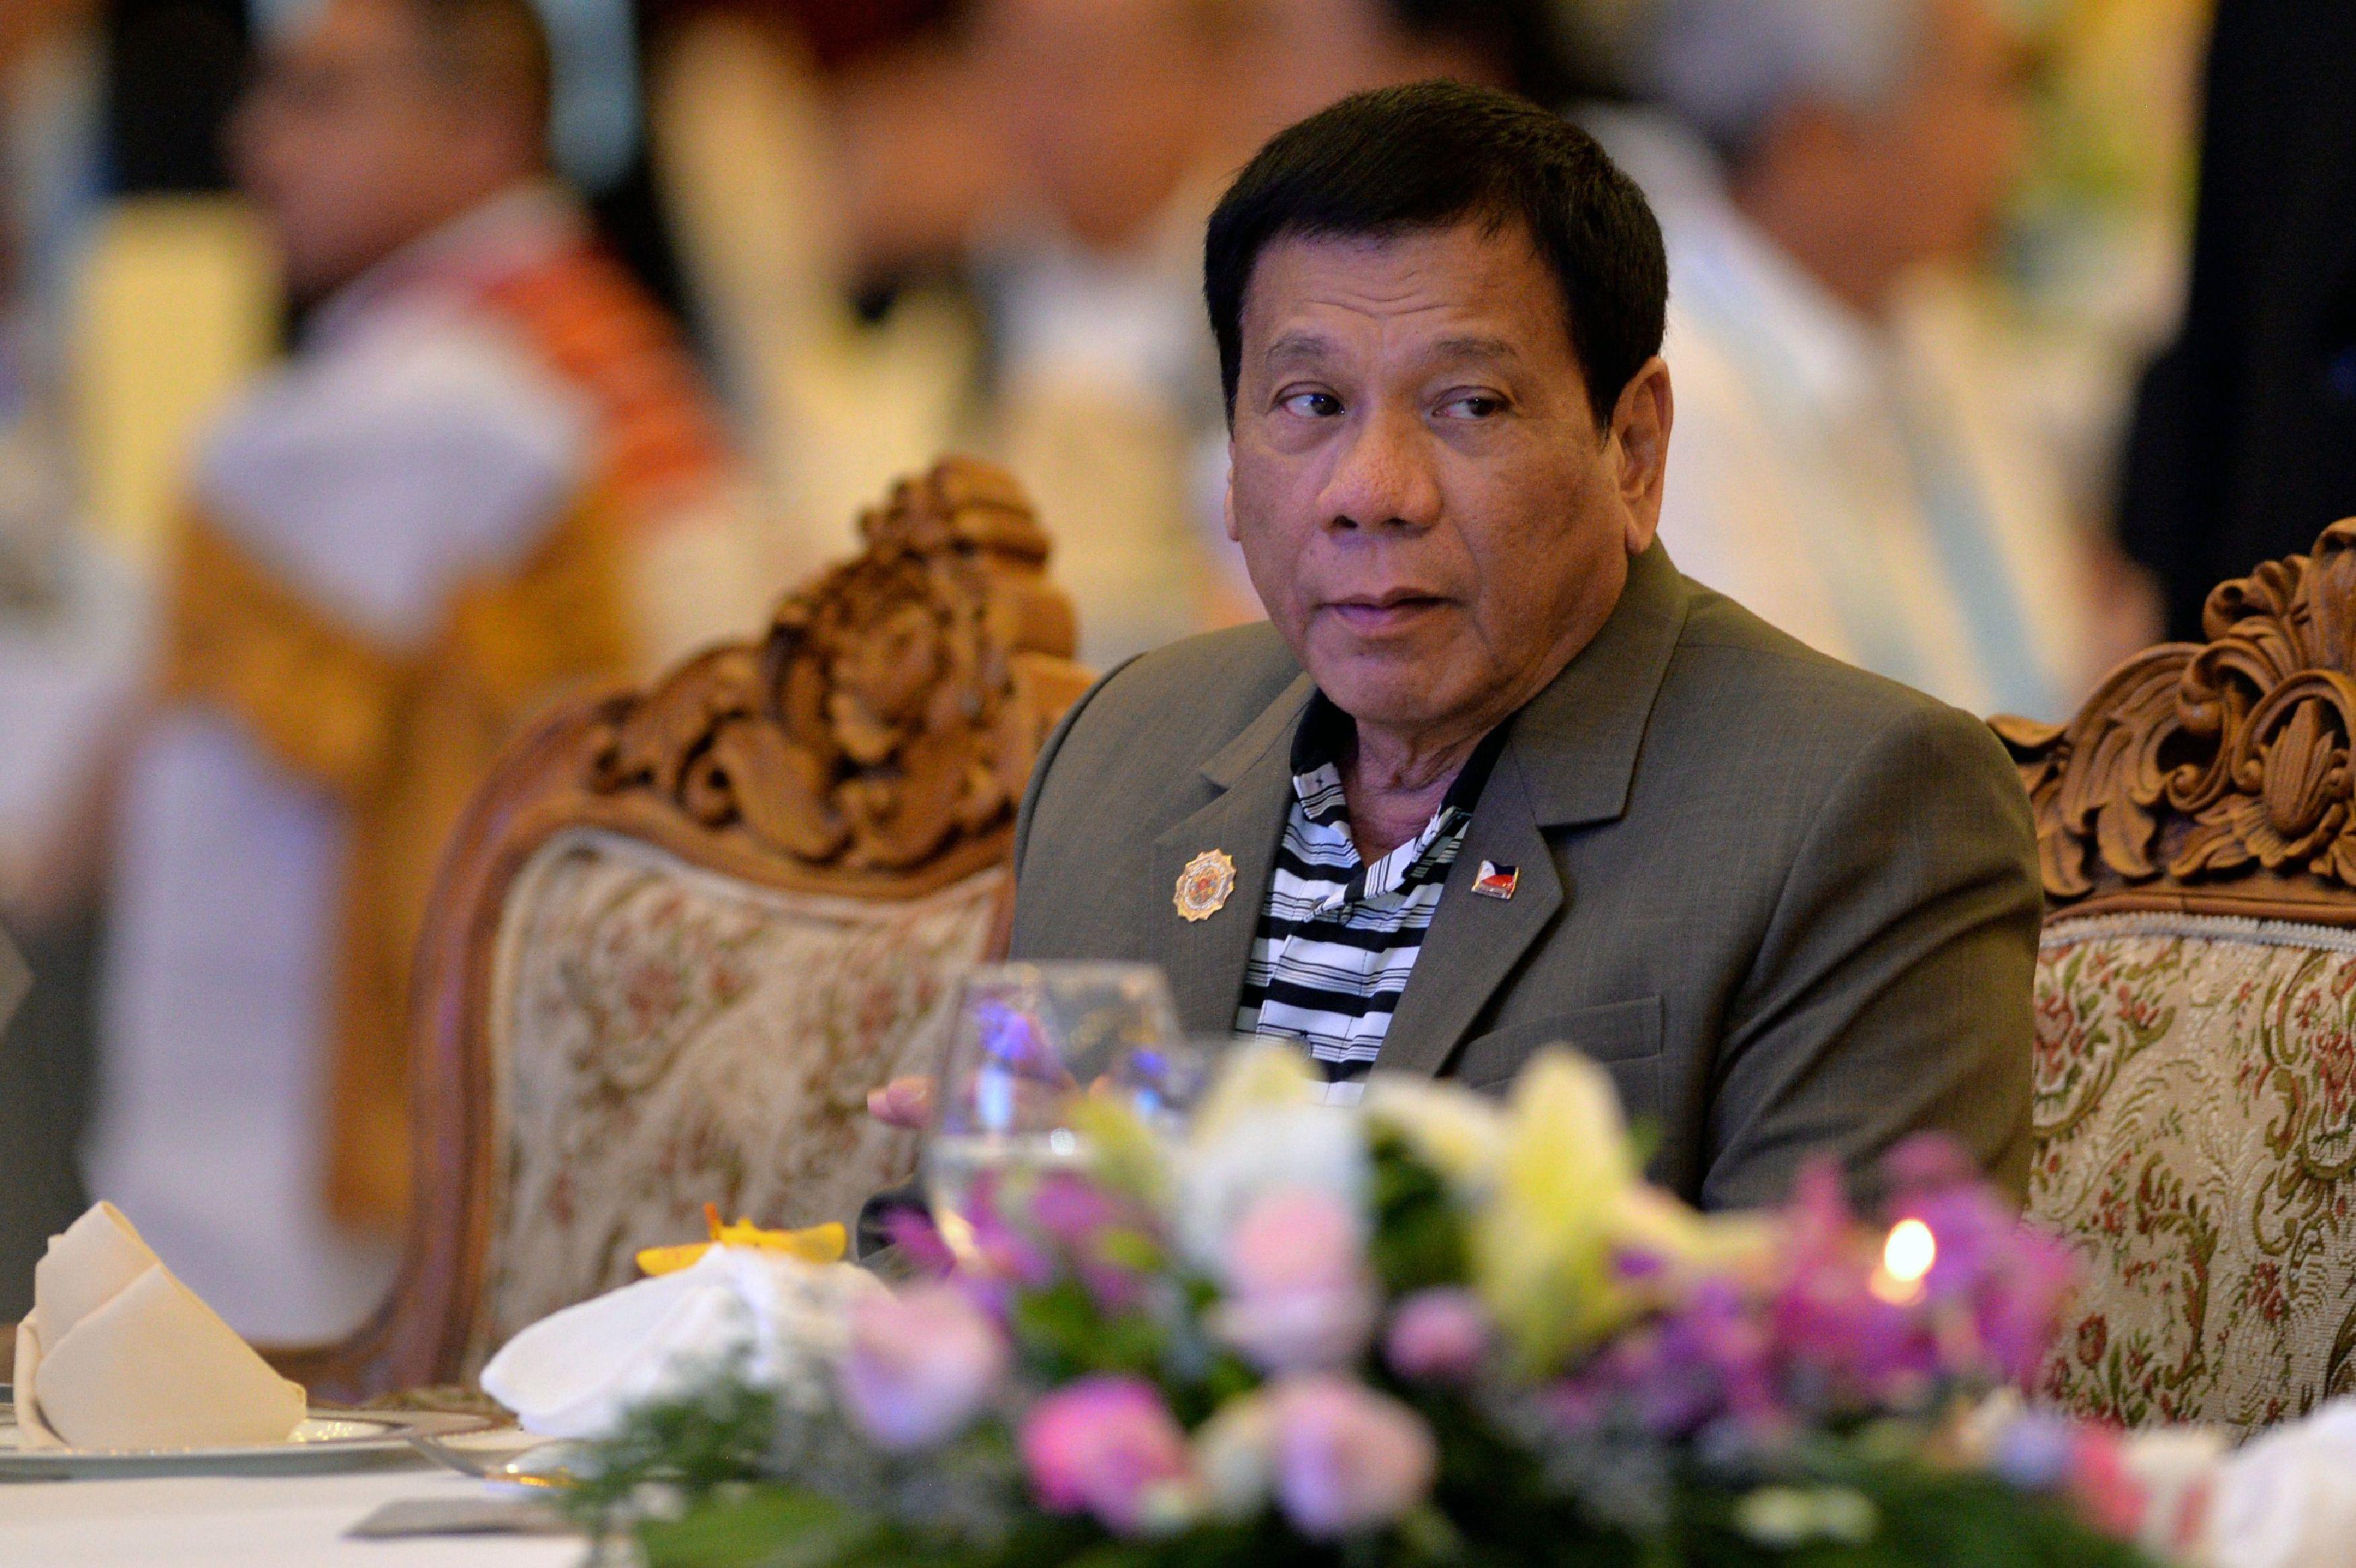 Philippine President Rodrigo Duterte attends a welcome dinner at the ASEAN Summit in Vientiane, Laos, on Sept. 6, 2016